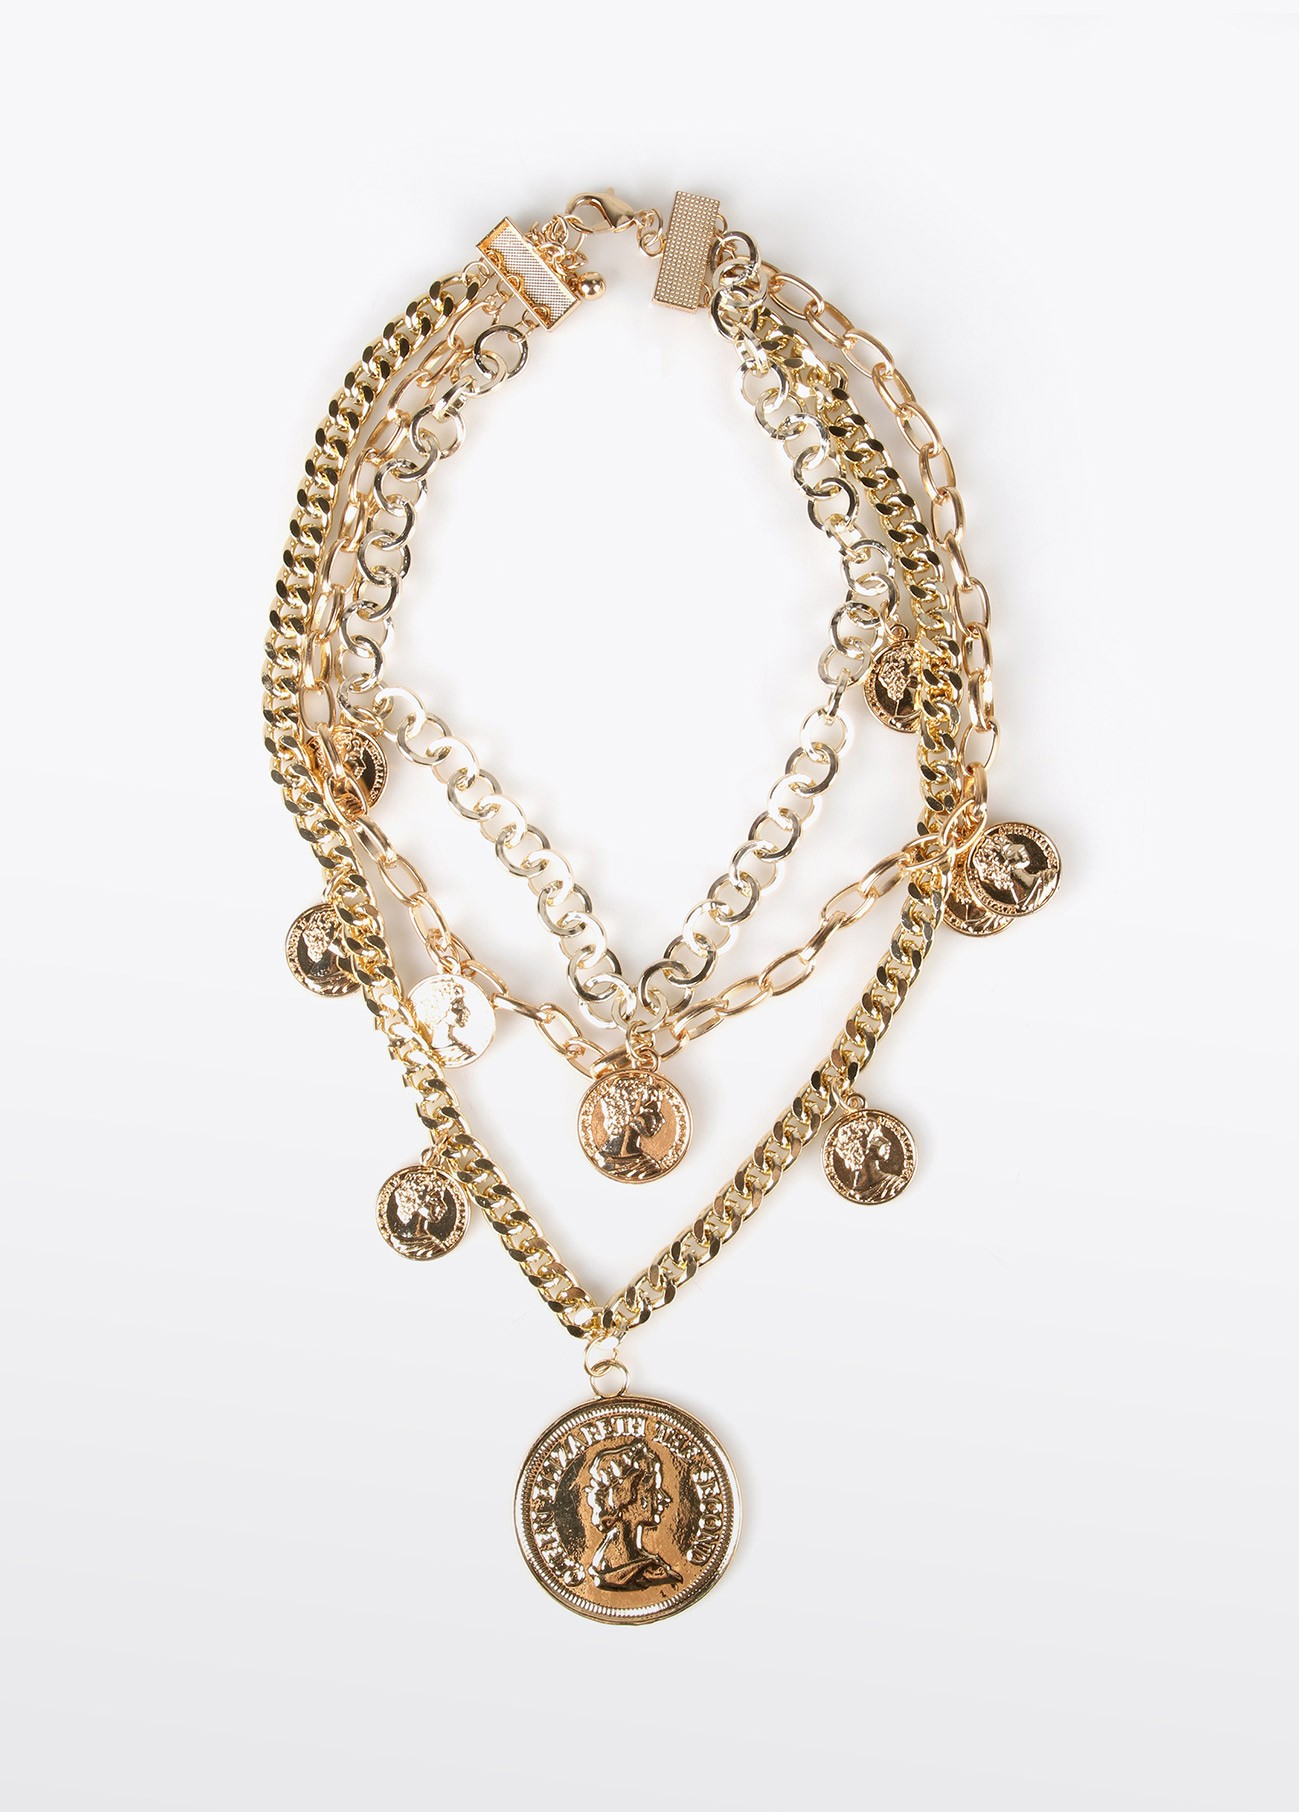 Collar multi cadenas colgante moneda, dorado